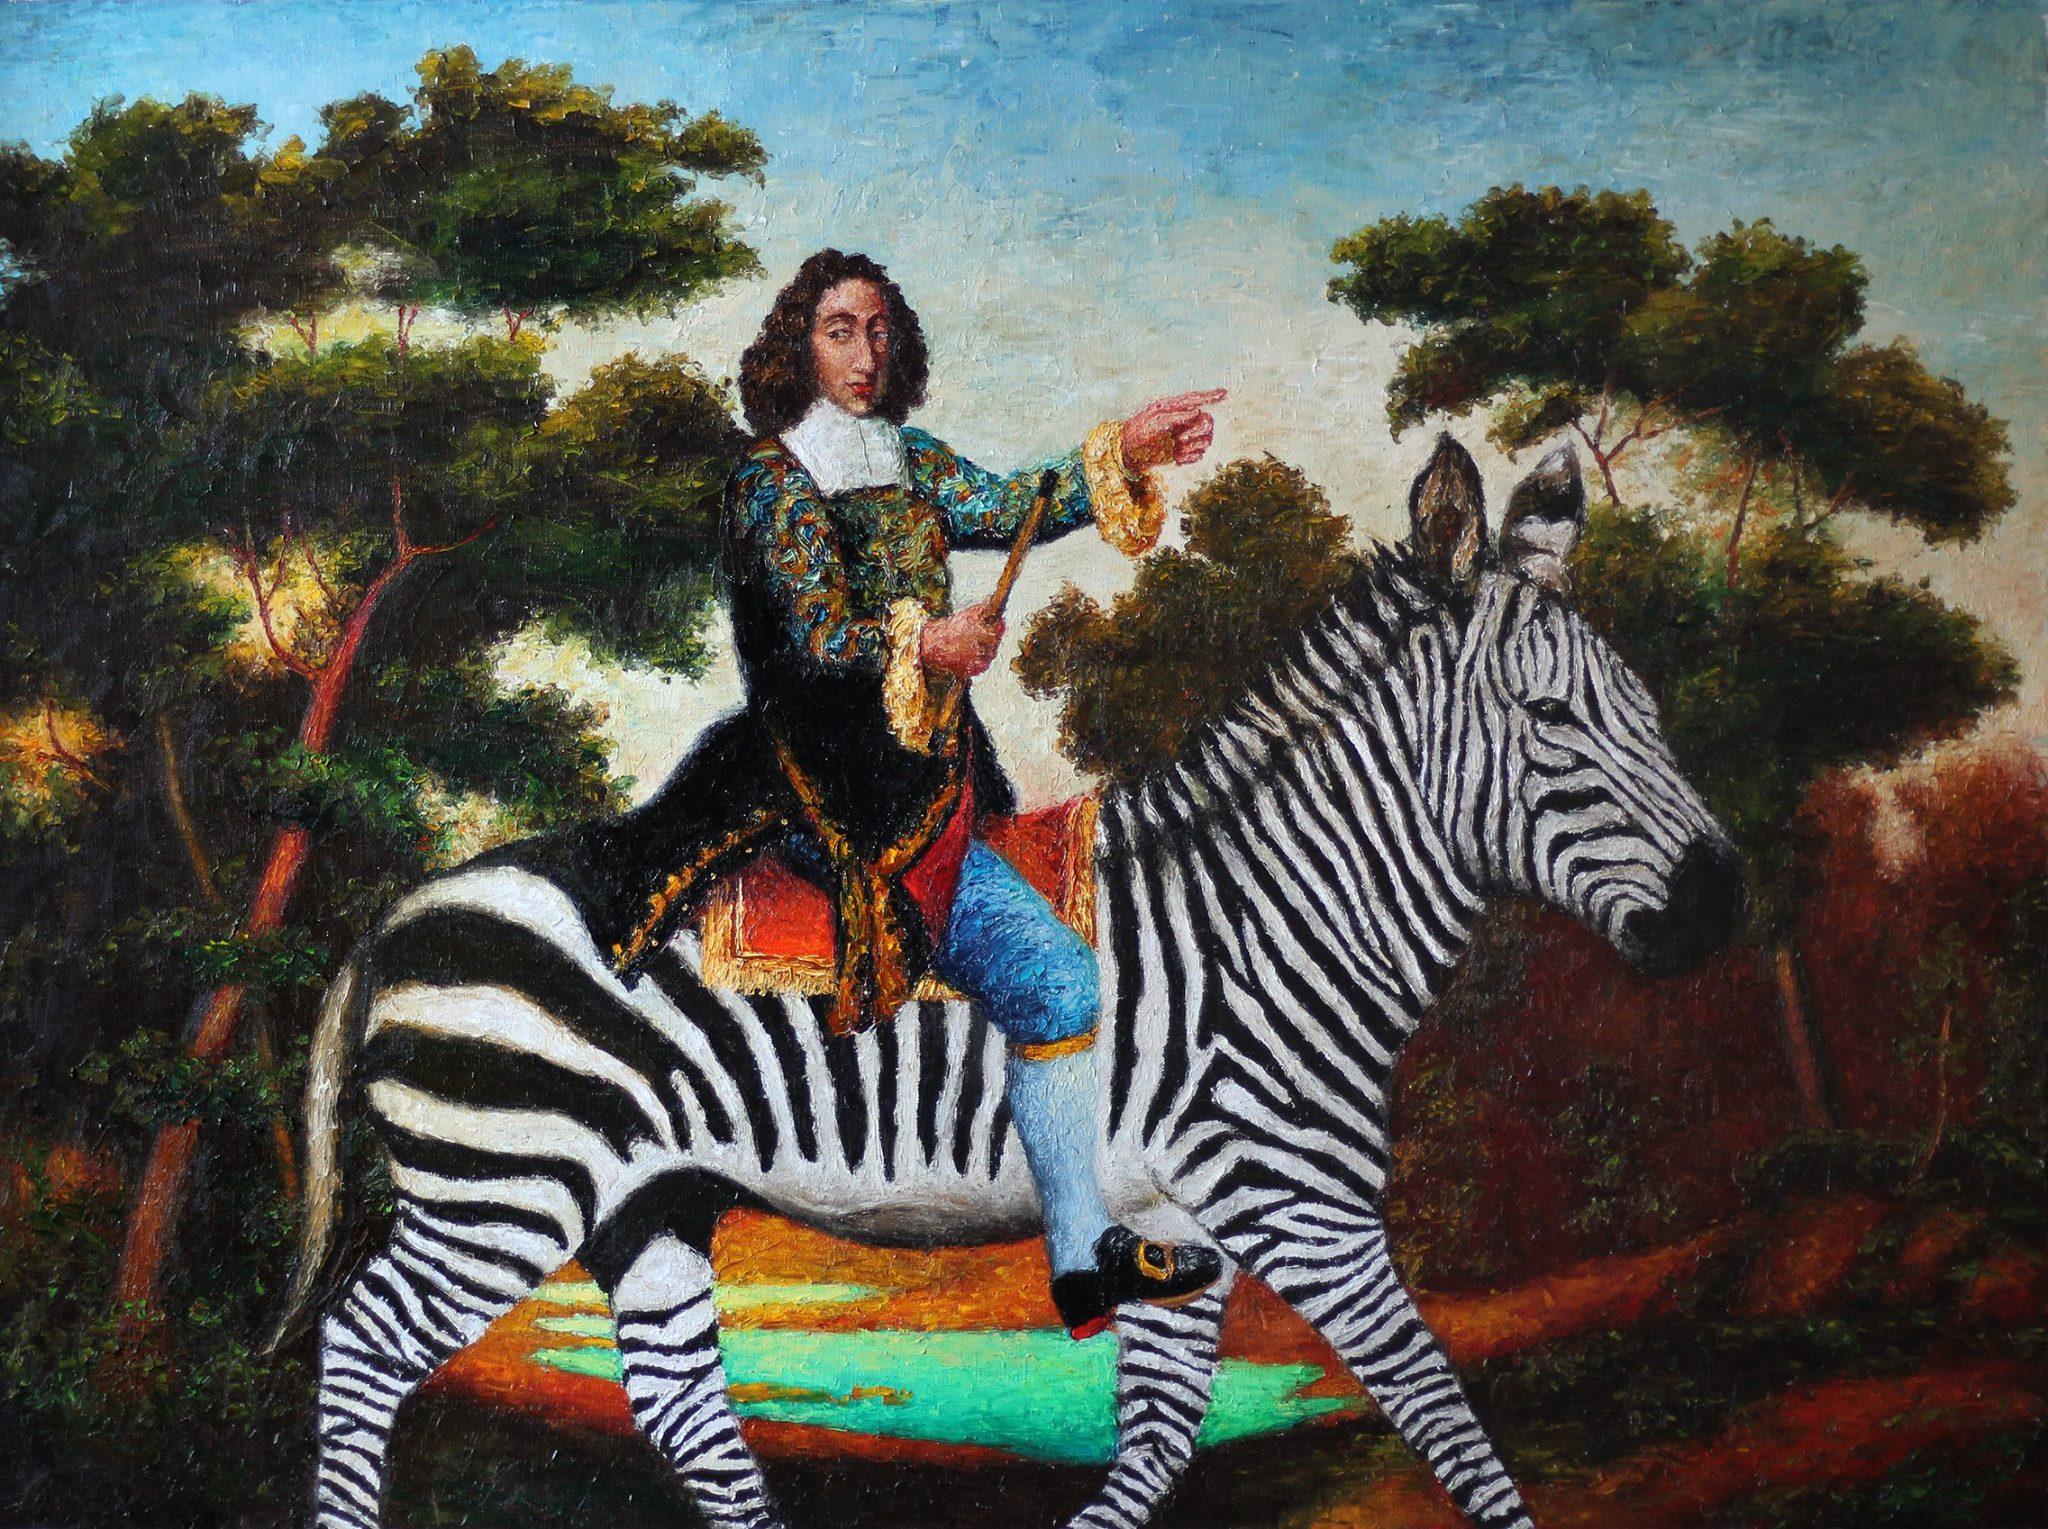 Выставка Александра Ройтбурда «Ройтбурд в музее»